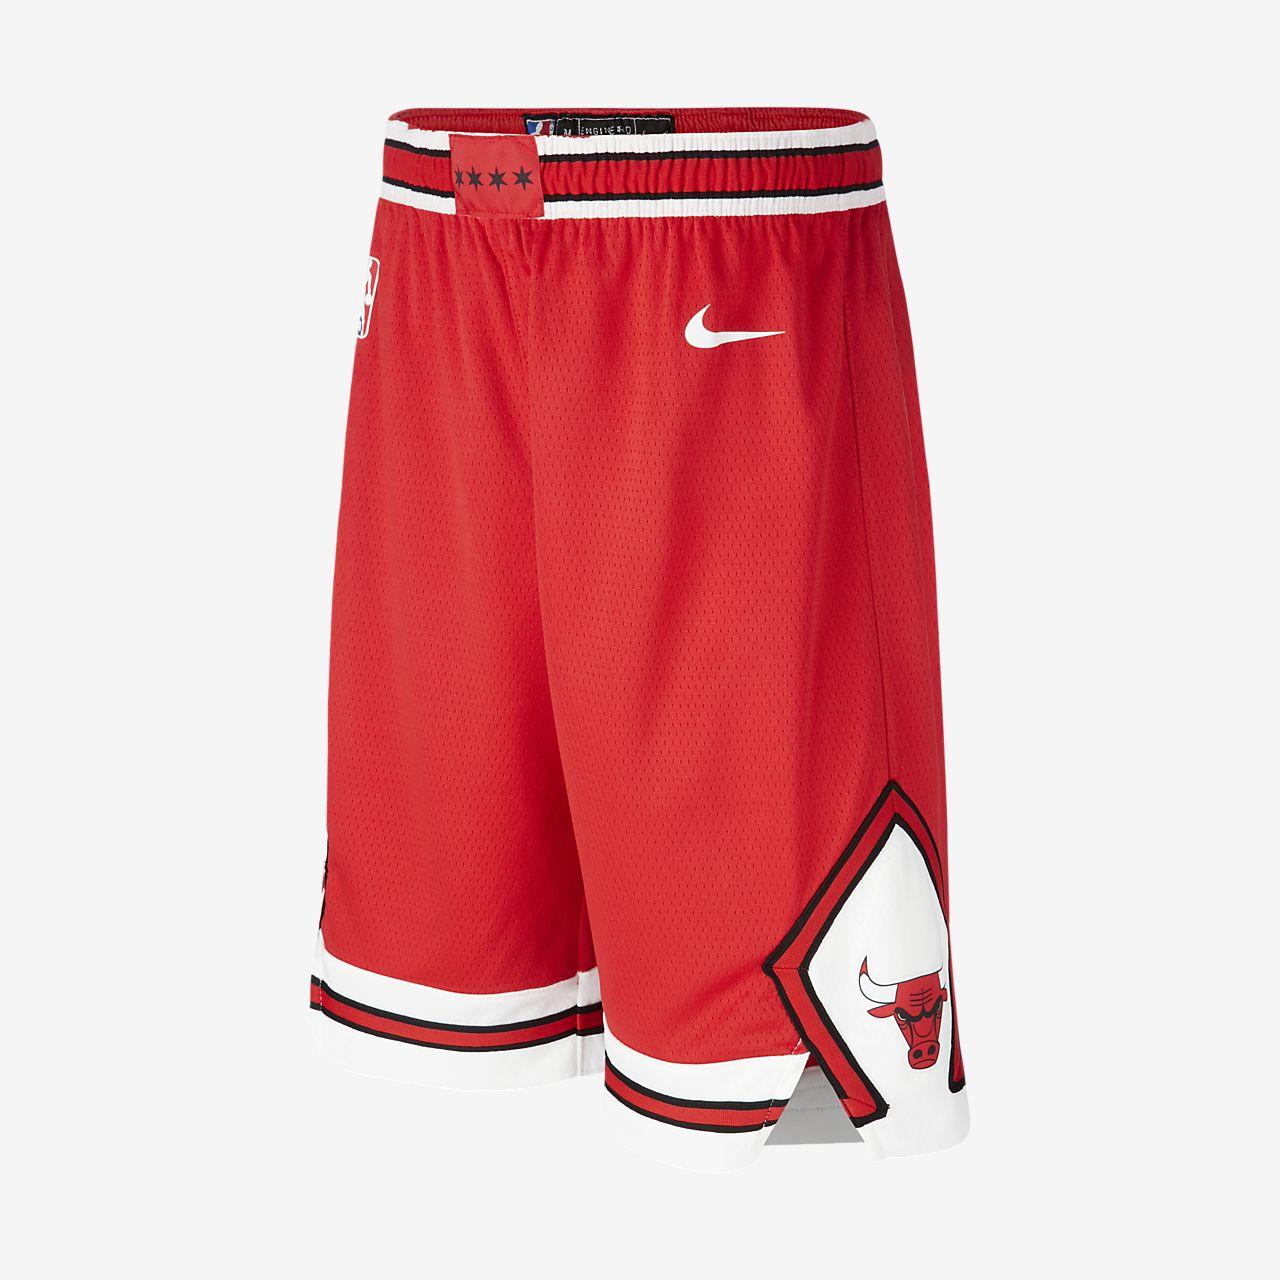 Chicago Bulls Nike Icon Edition Swingman NBA-Shorts für ältere Kinder (Jungen)